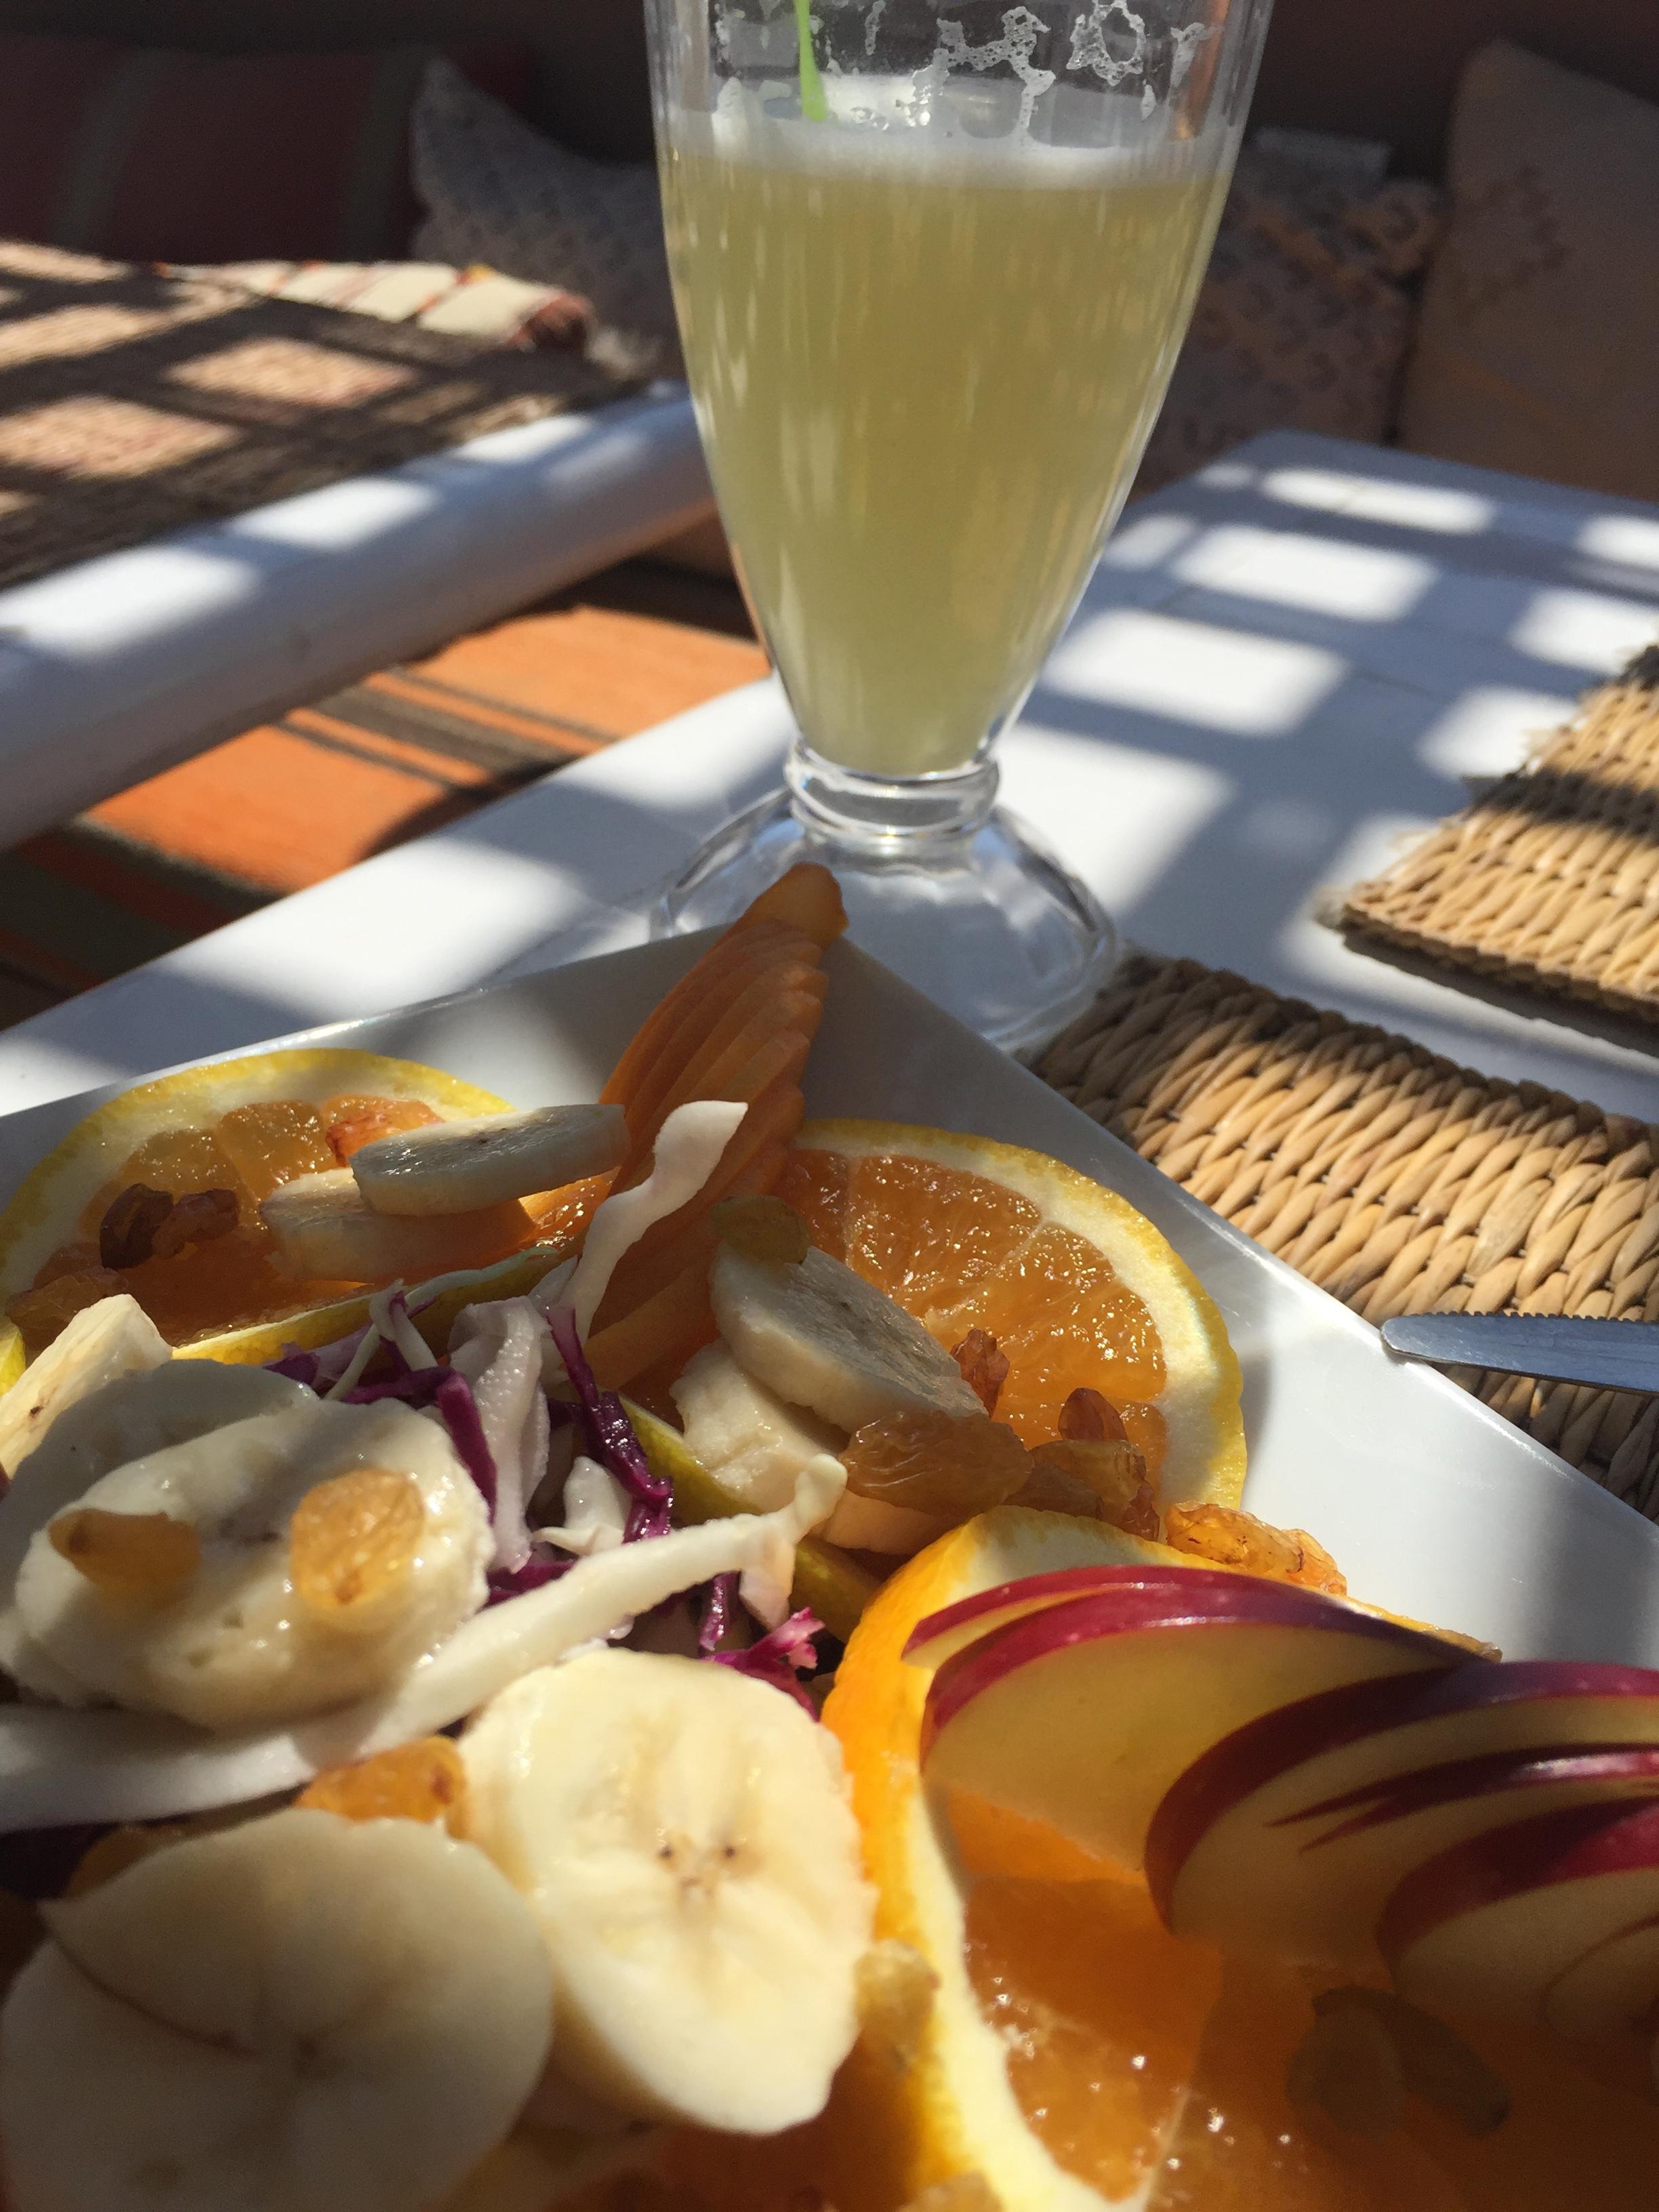 Jill's fruit salad in dappled terrace light